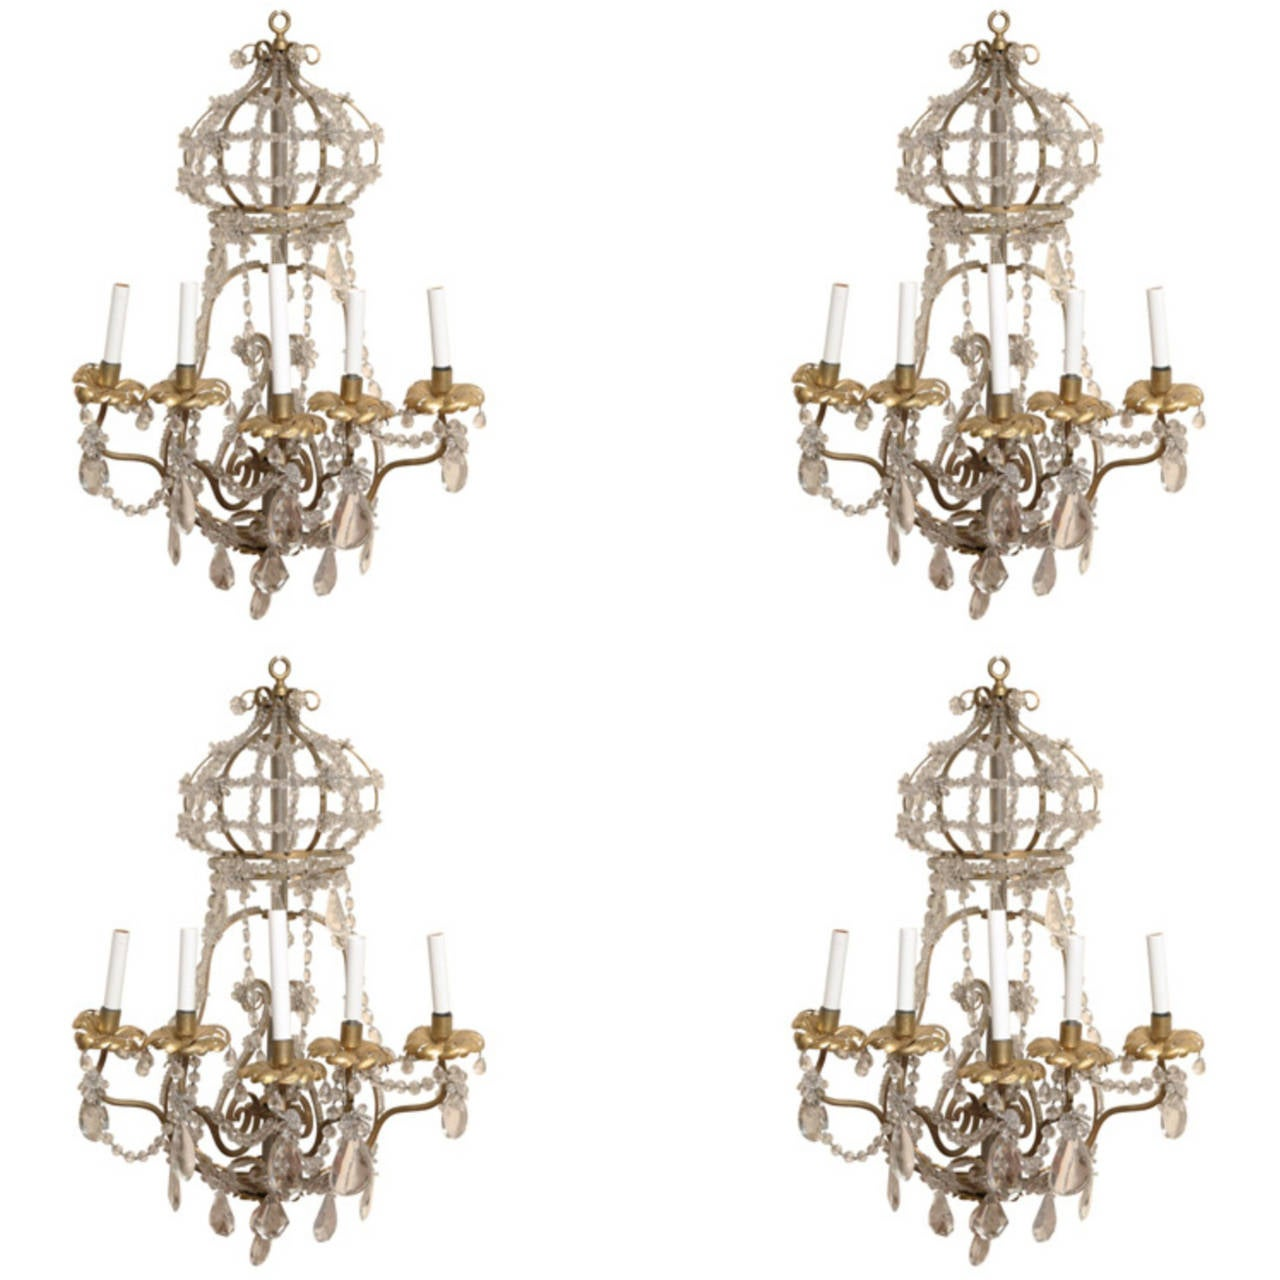 Set of Four Large Gilt Metal and Crystal Wall Lights Sconces